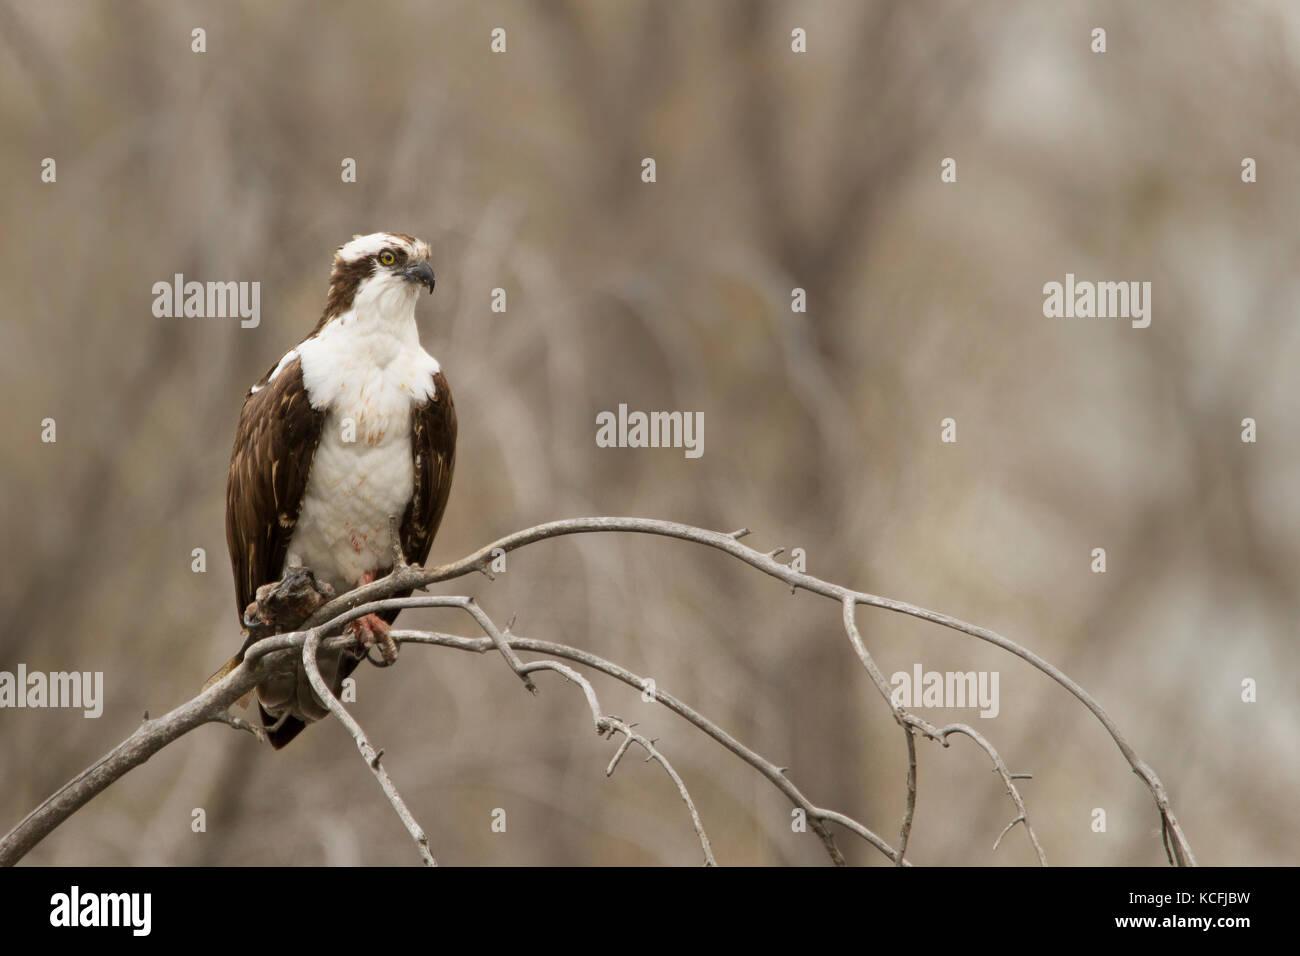 Osprey Great Basin Wüste Tour Washington United States Stockfoto